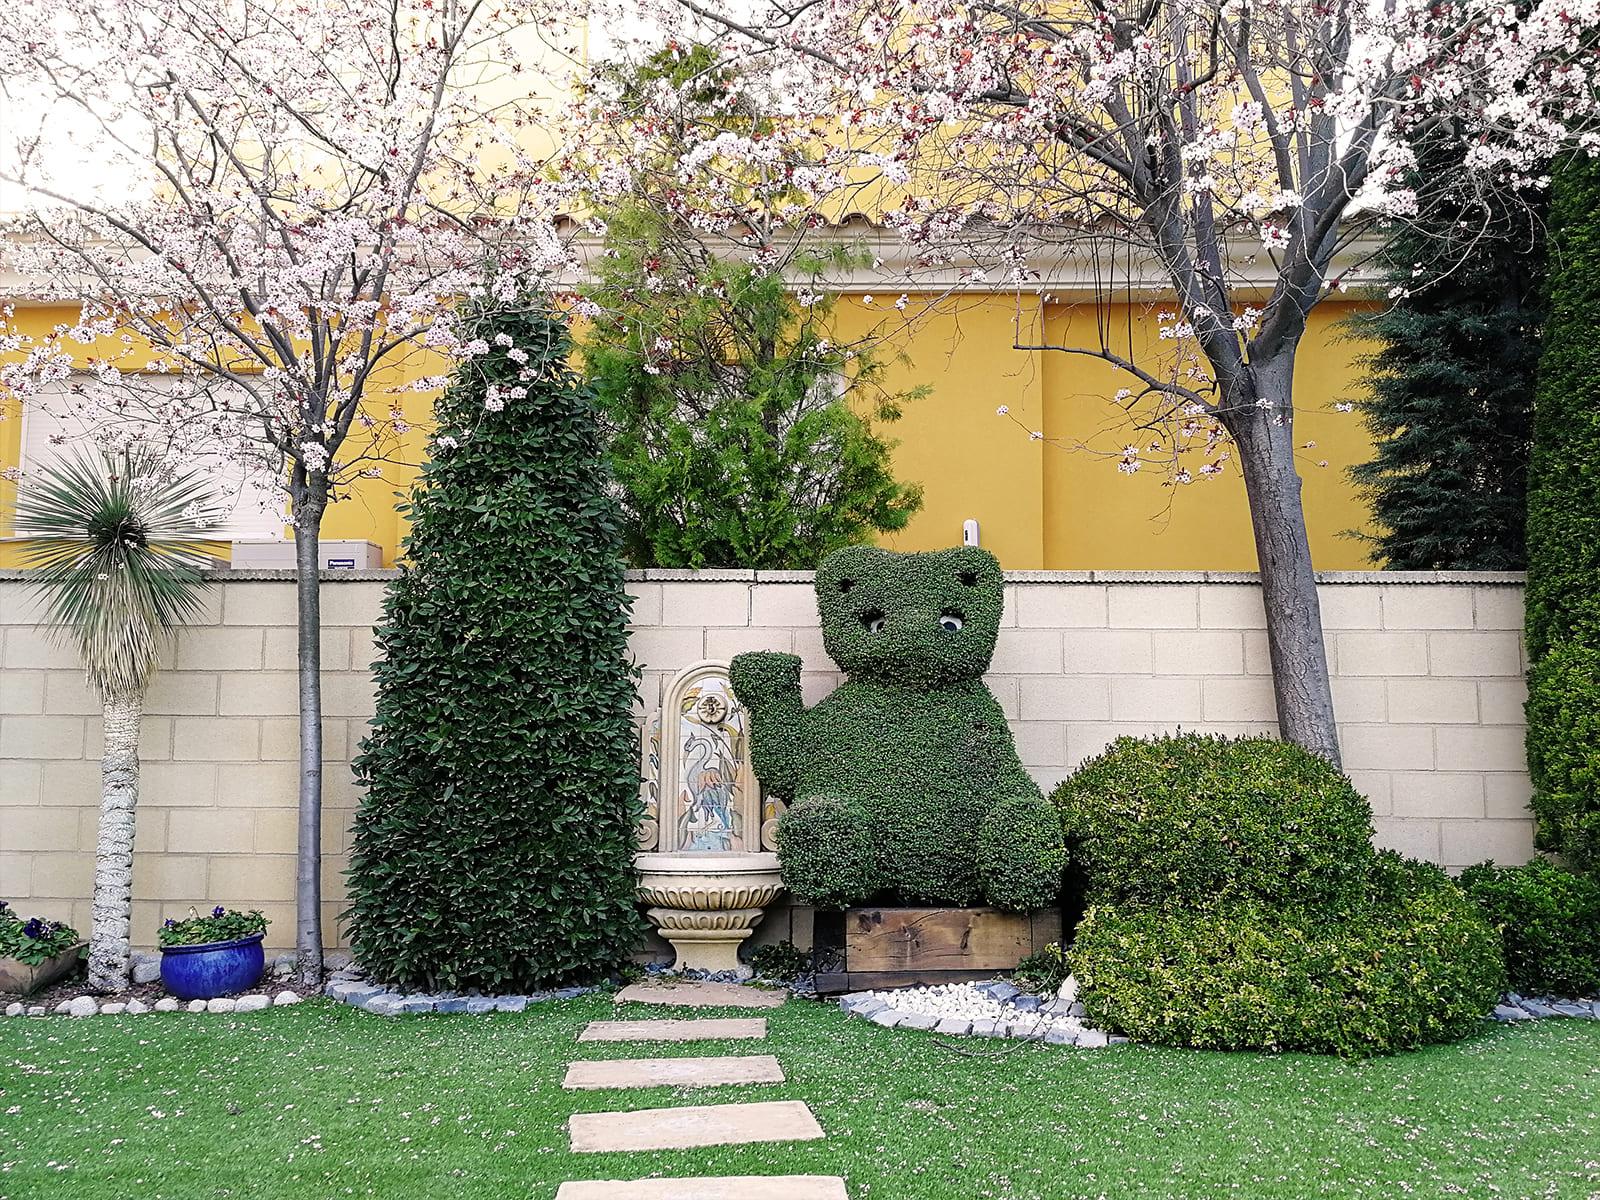 diseño-jardines-jardin-decoracion-IN-04_HIDROJARDIN-Bañeres